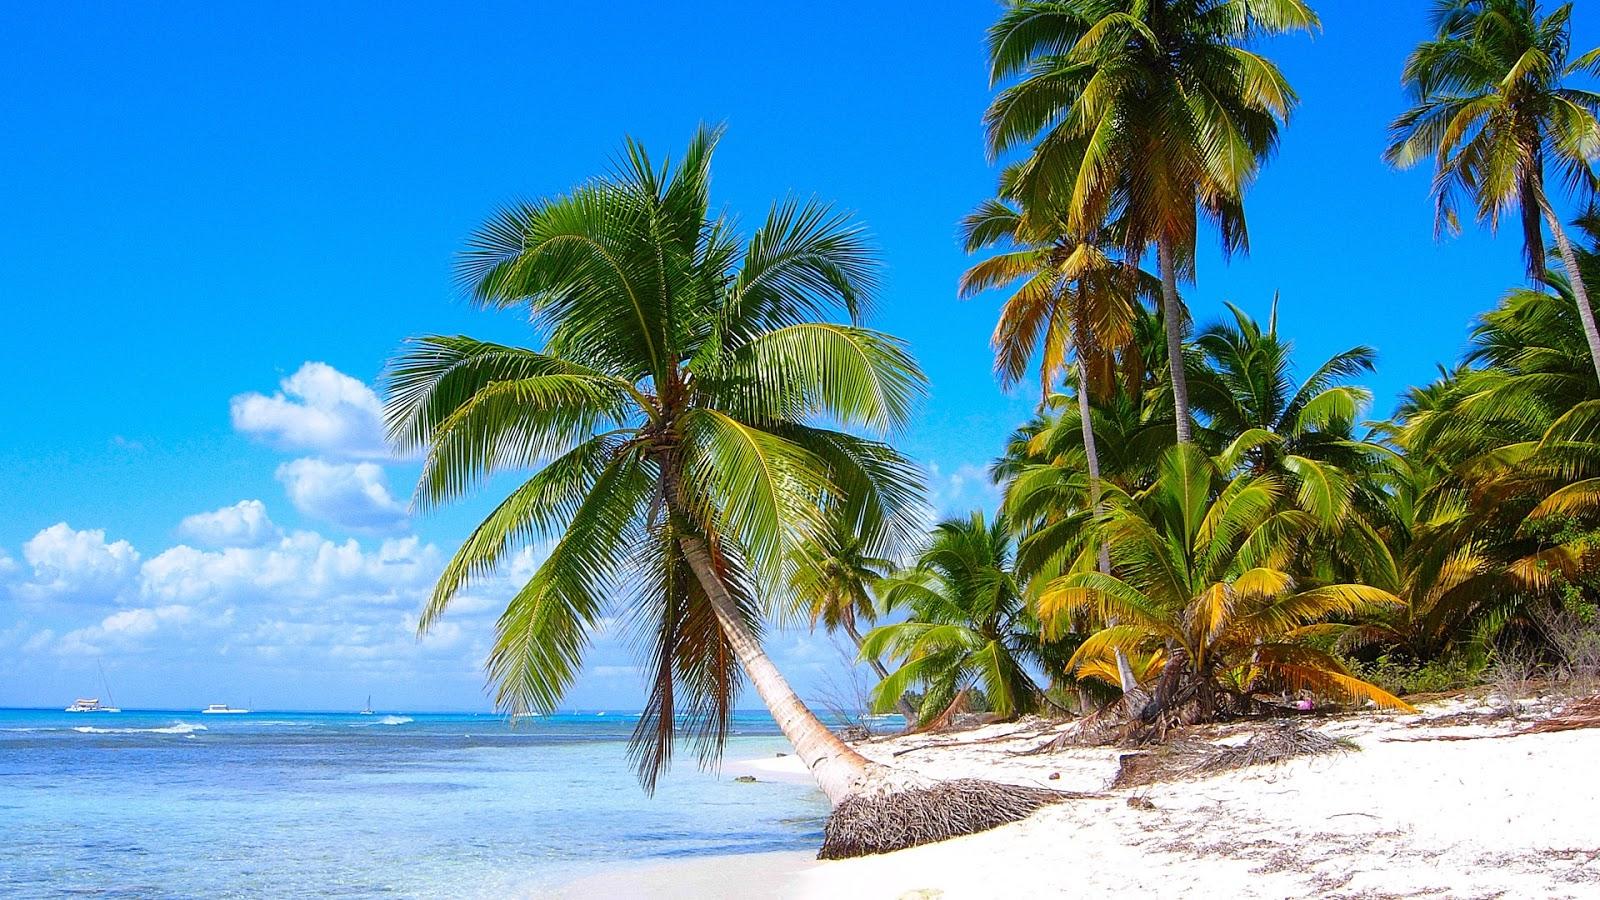 Caribbean Coconut Beach HDQ Wallpapers 1600x900